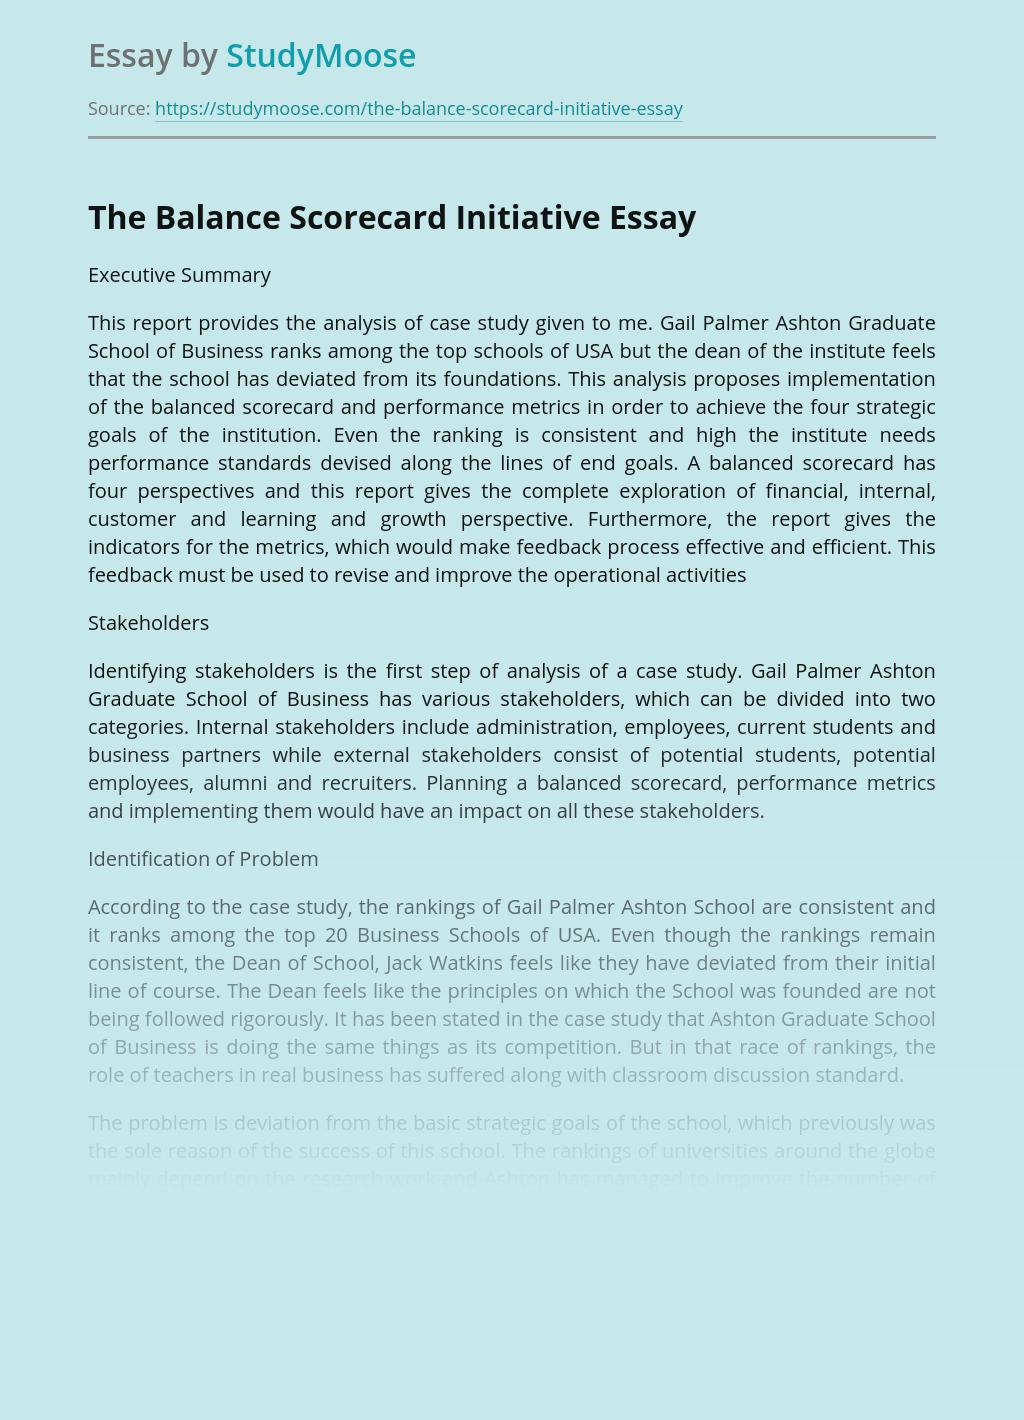 The Balance Scorecard Initiative